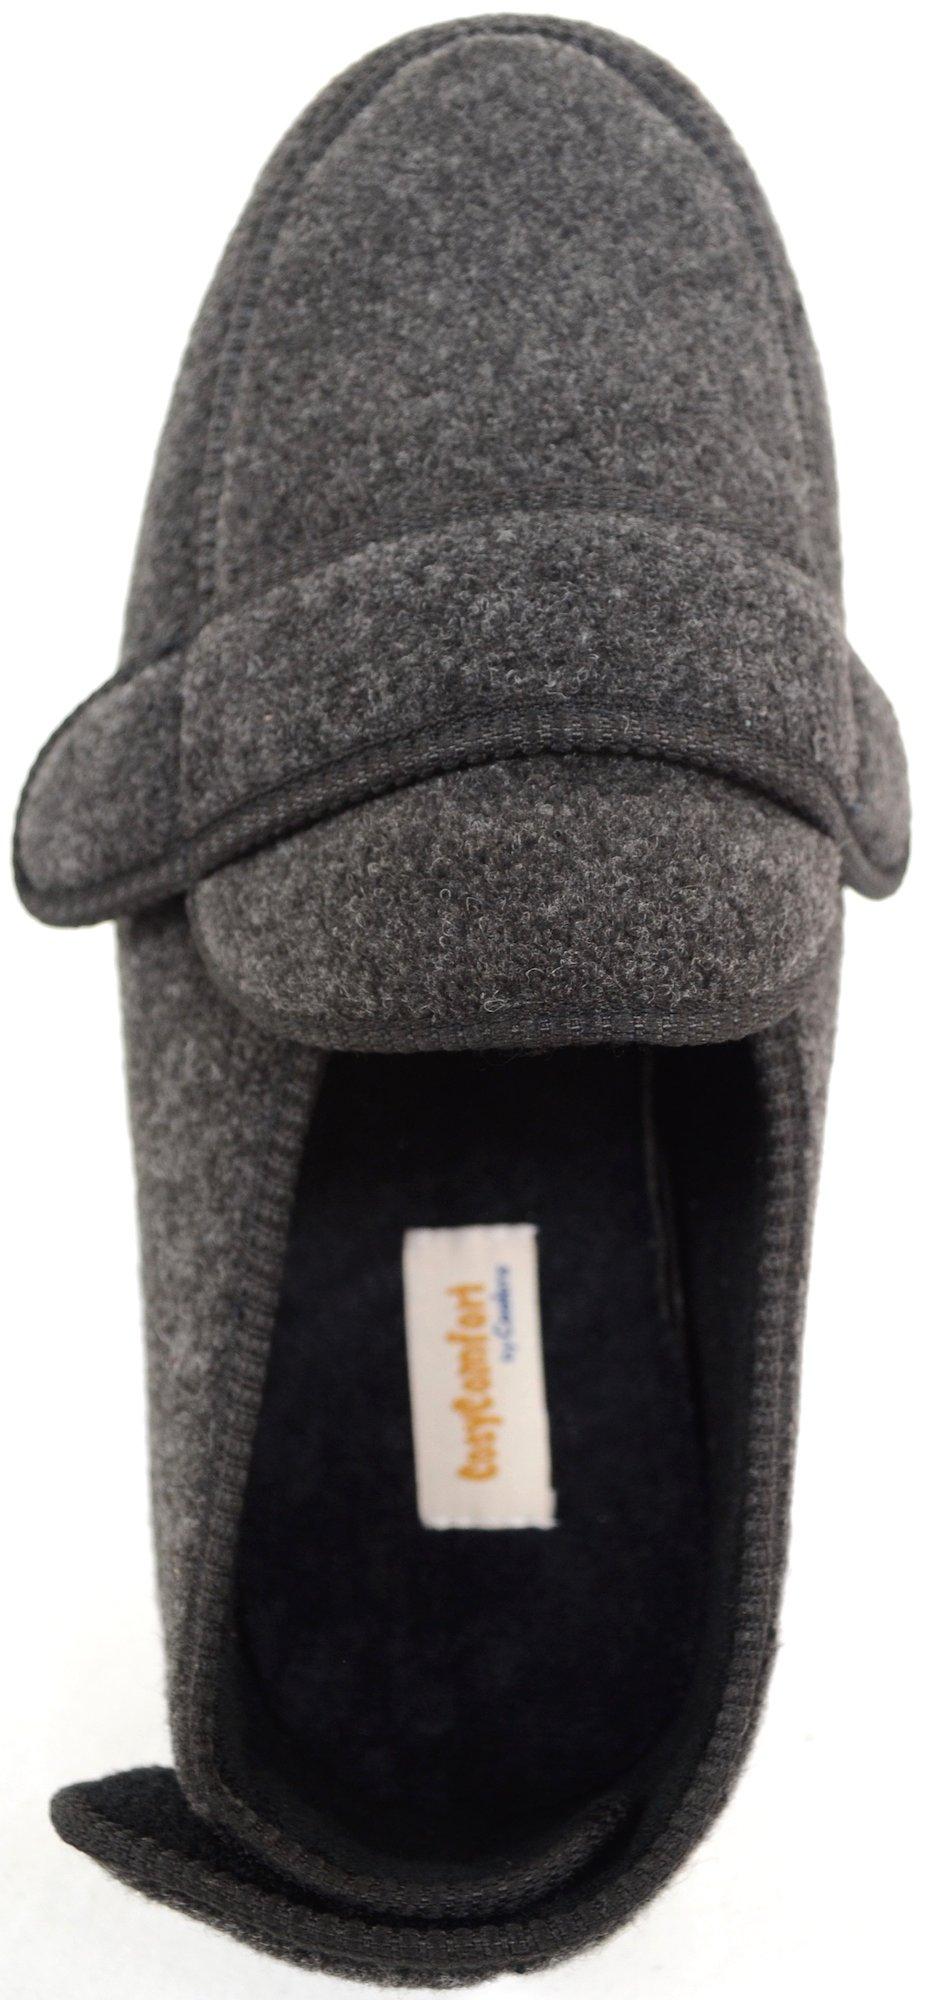 ABSOLUTE FOOTWEAR Mens Orthopaedic/Extra Wide Fit Adjustable Slipper Boot/Slippers - Grey - 10 US by ABSOLUTE FOOTWEAR (Image #6)